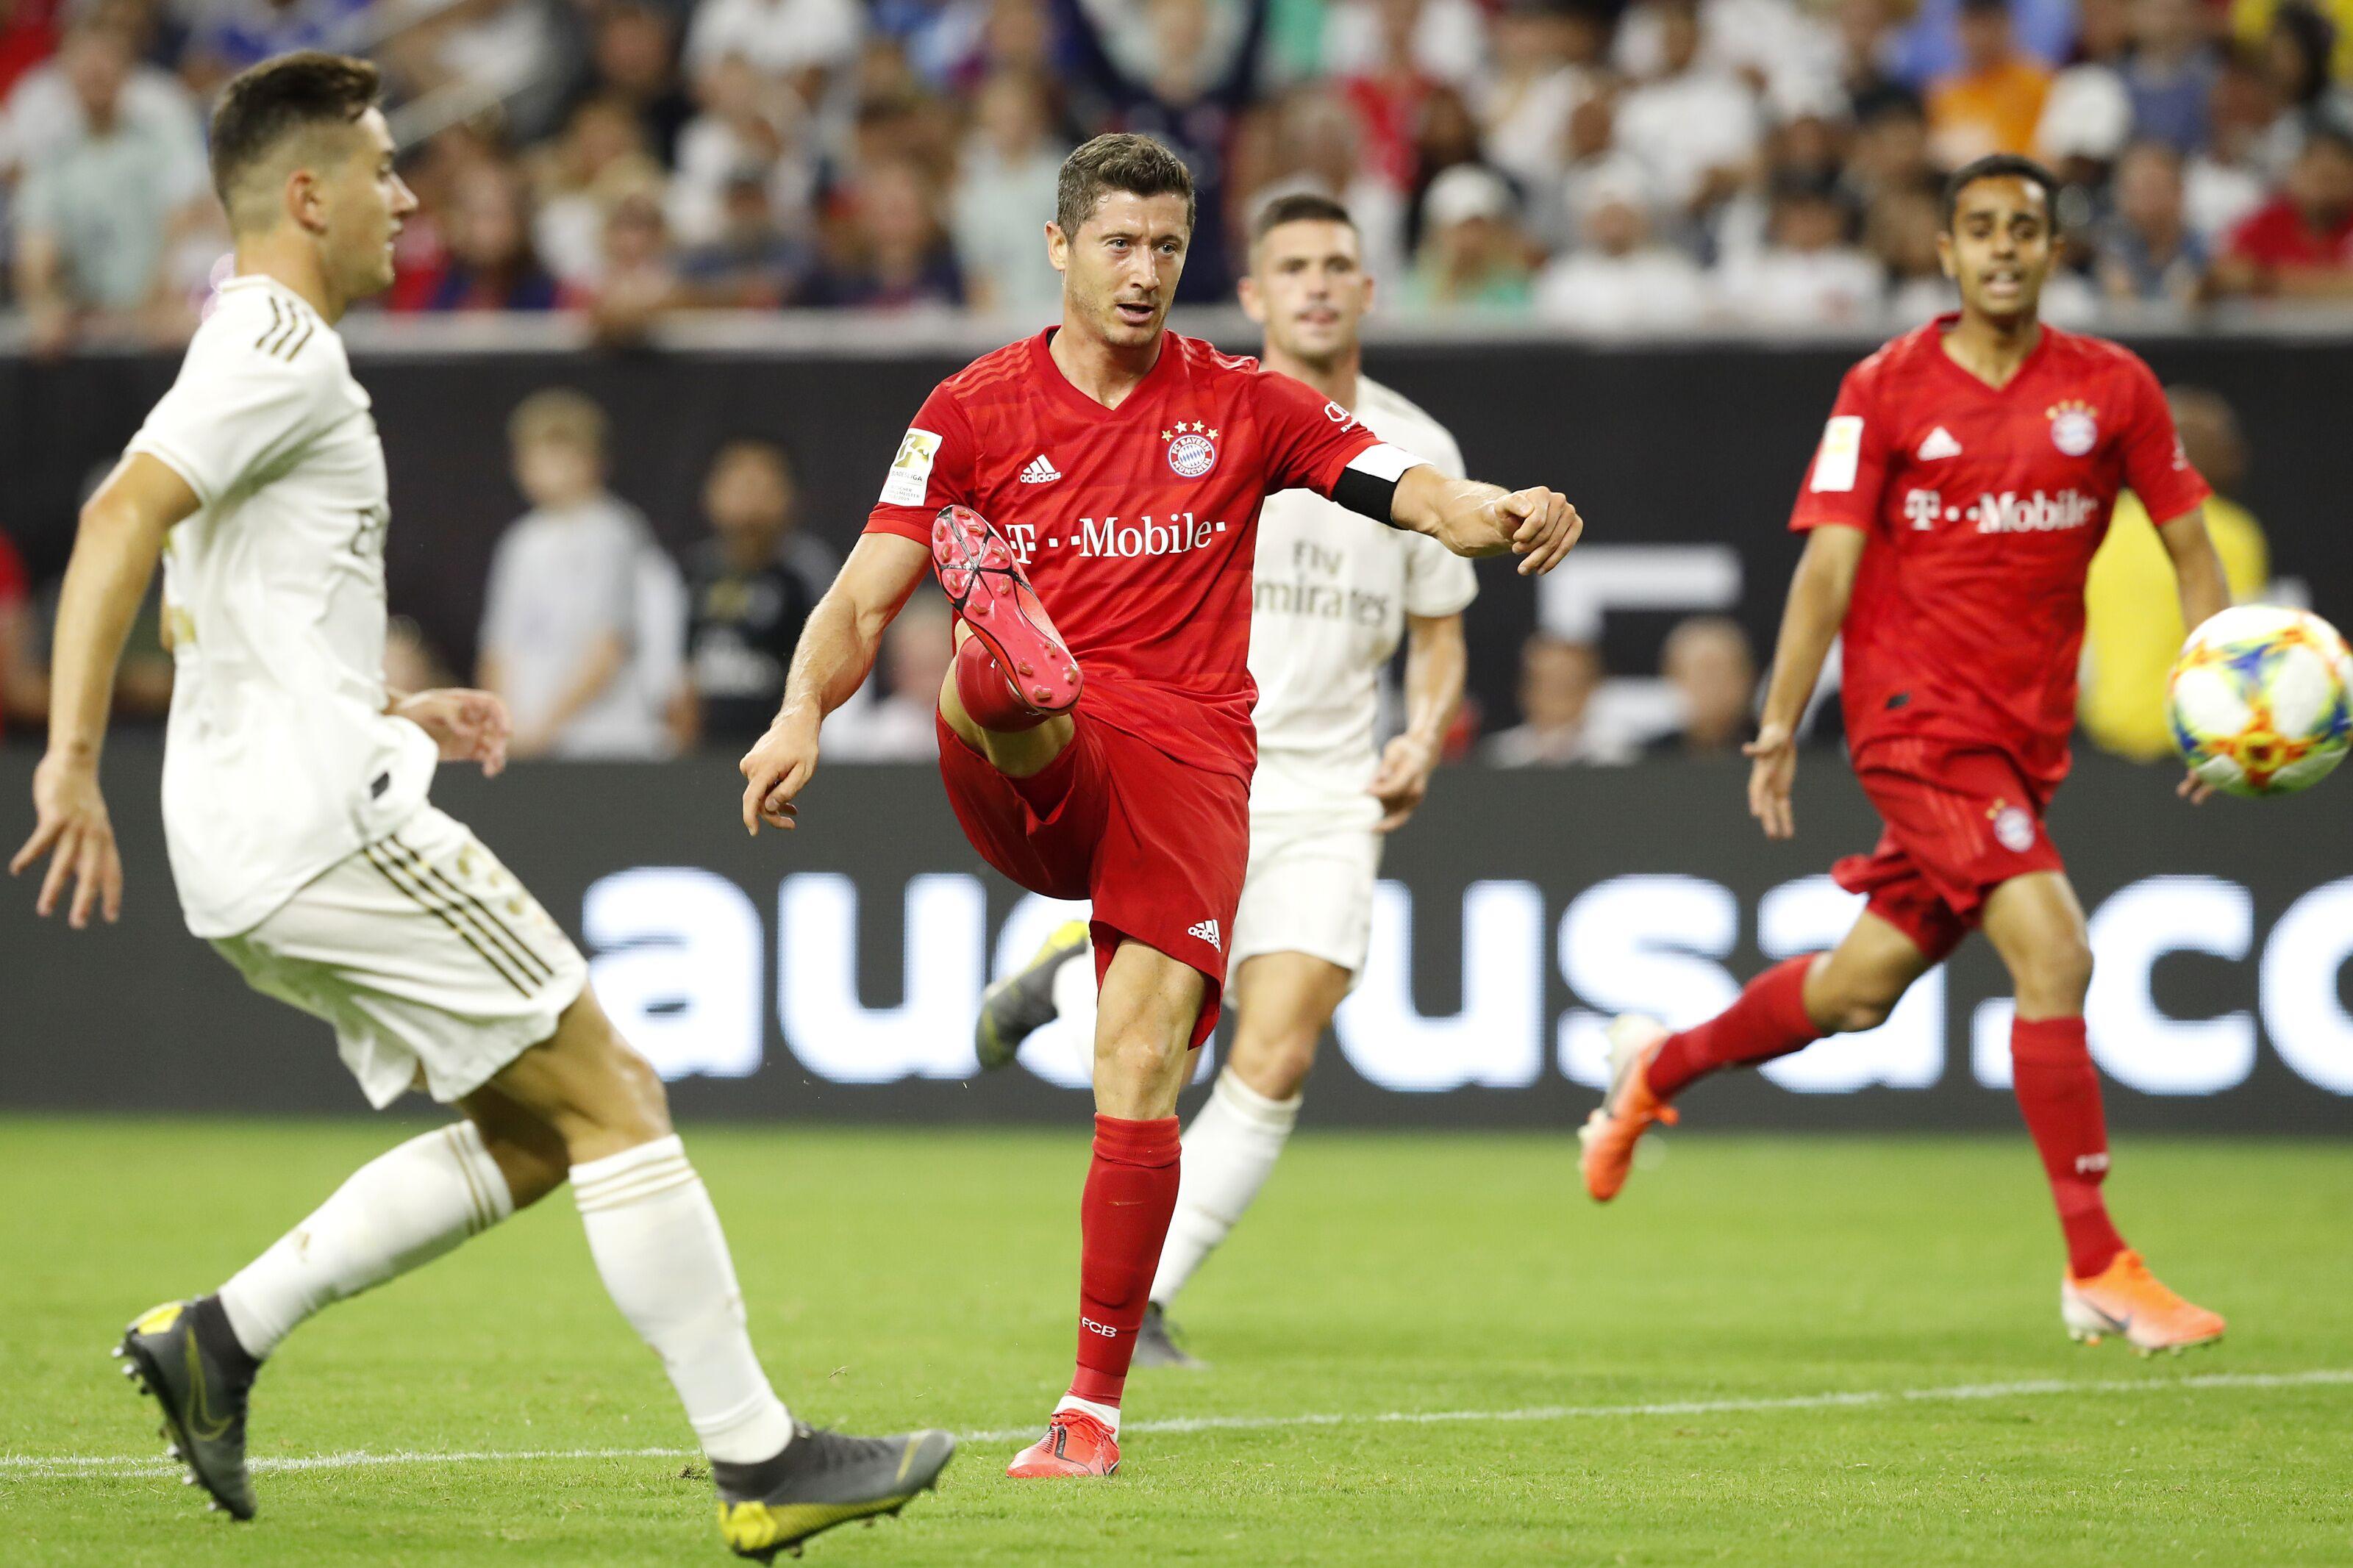 Bayern Munich striker Robert Lewandowski wants to play longer at top level